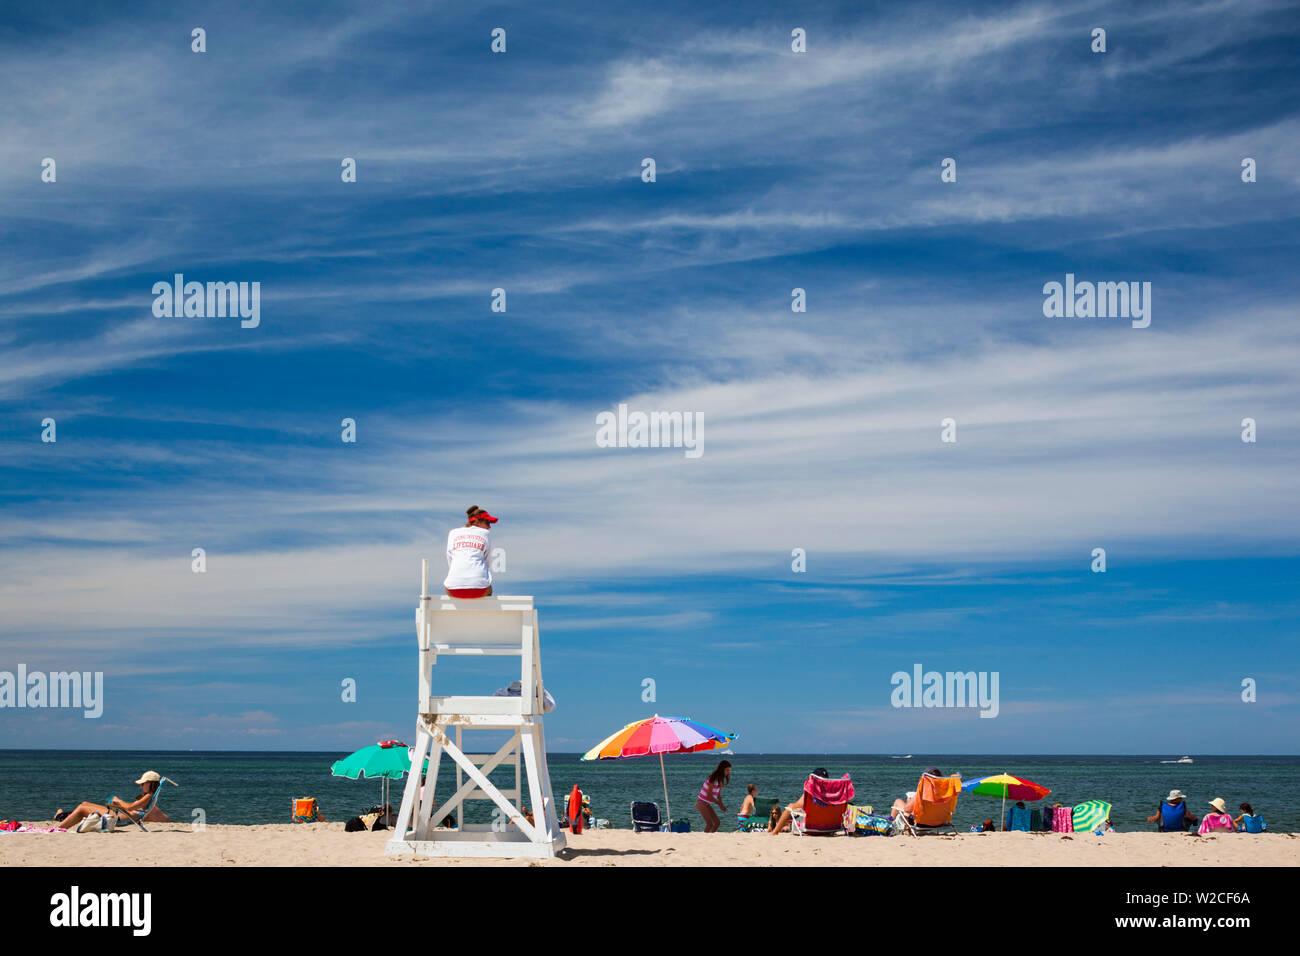 USA, Massachusetts, Cape Cod, Provincetown, Race Point Beach - Stock Image